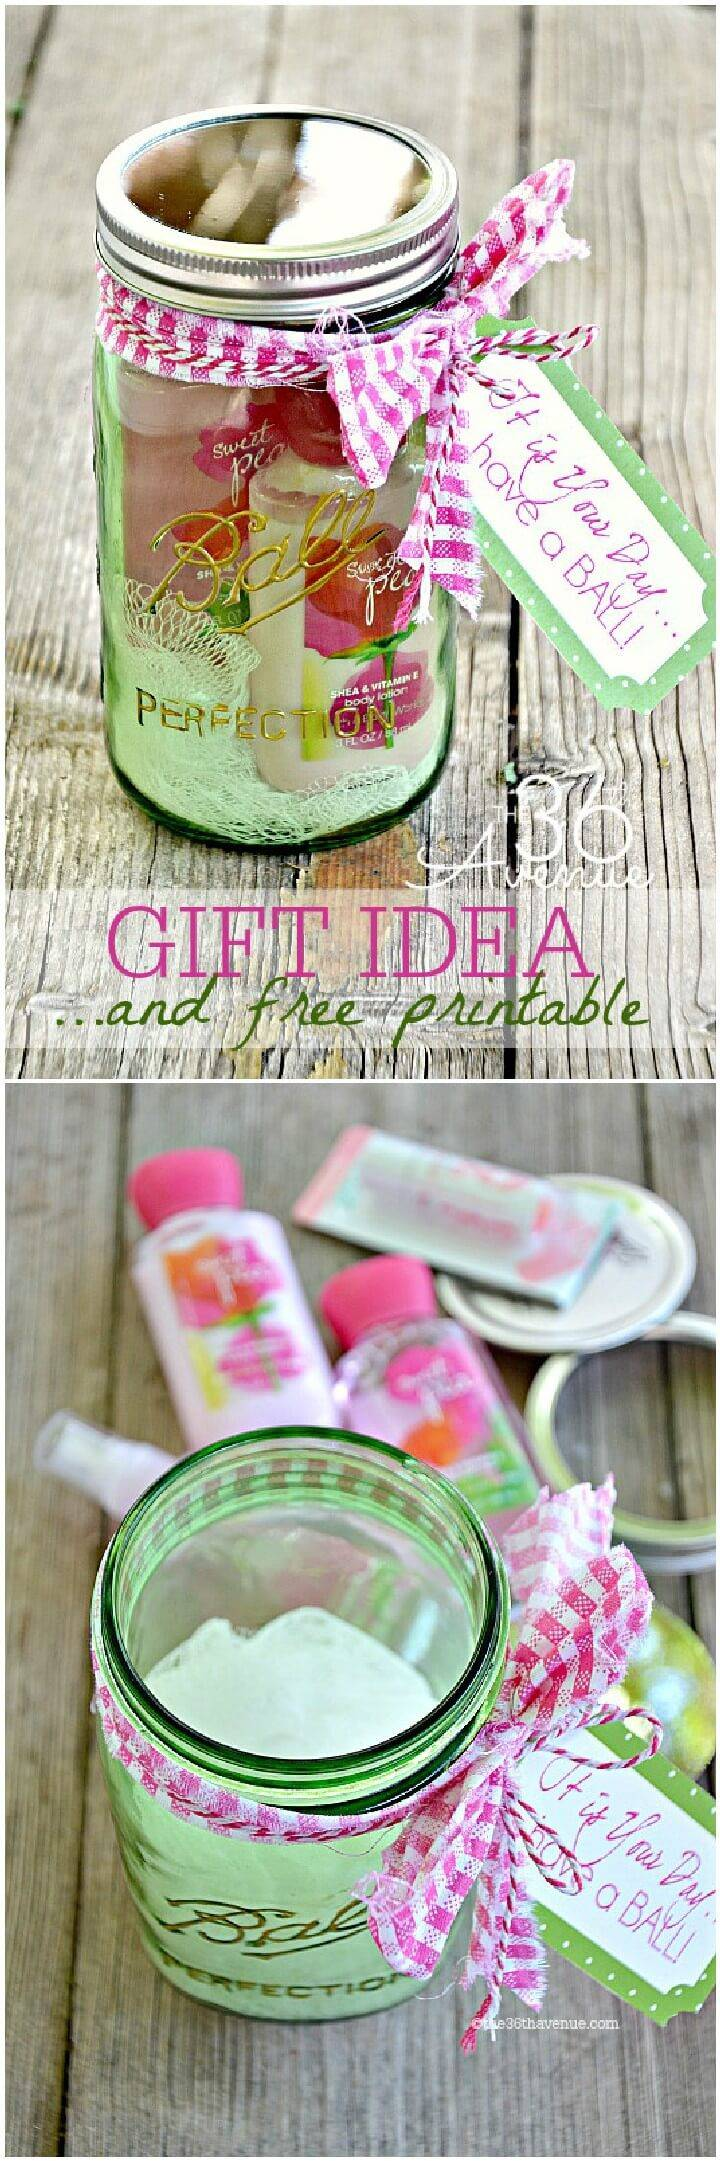 160 Diy Mason Jar Crafts And Gift Ideas Diy Crafts